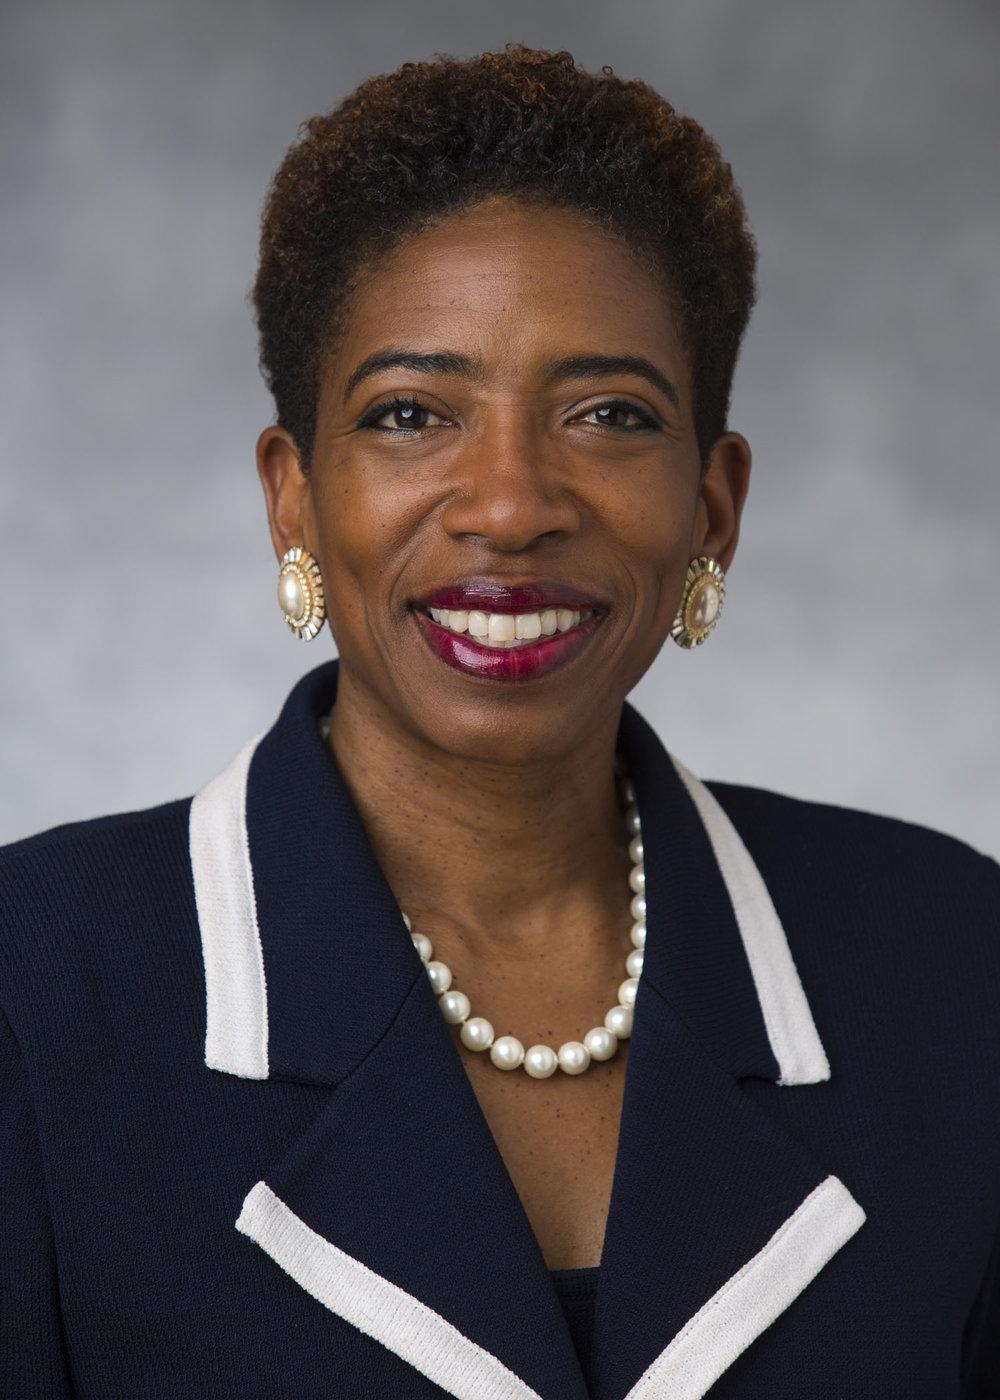 Carla Harris